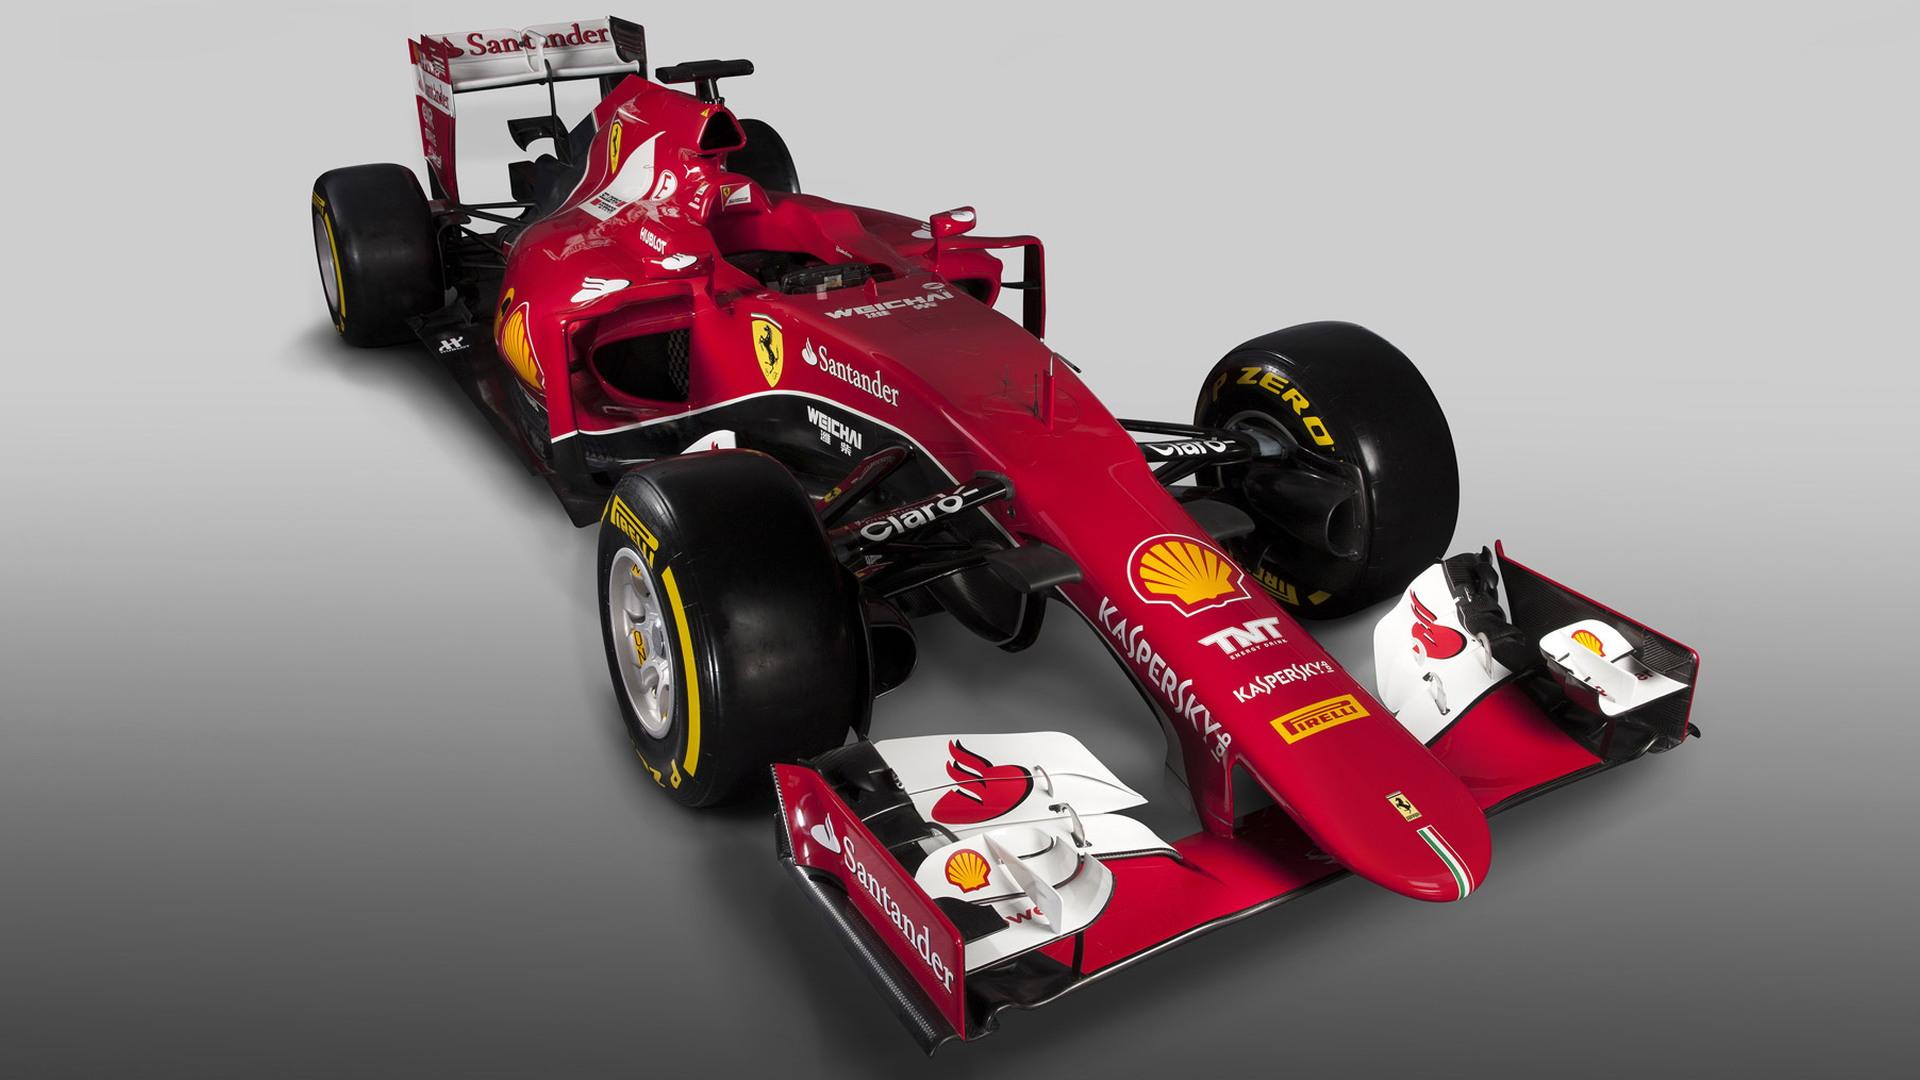 Ferrari SF15-T 2015 Formula One car